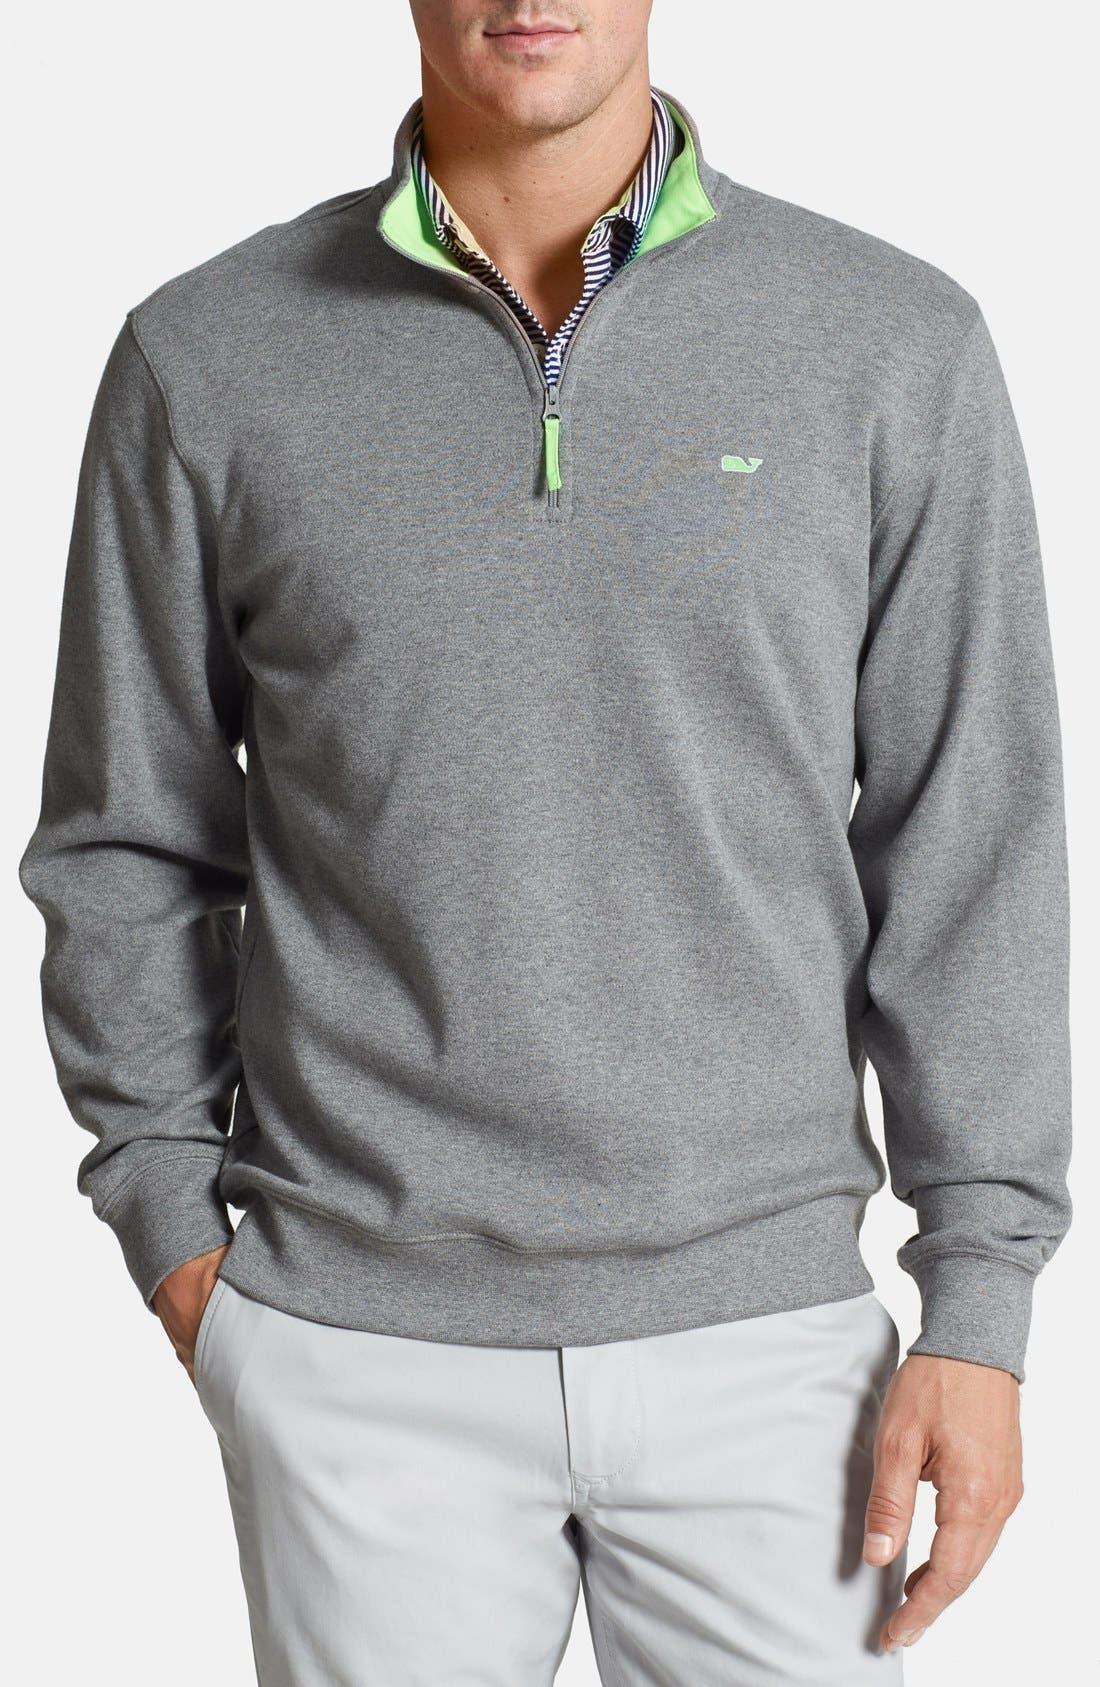 Main Image - Vineyard Vines Quarter Zip Cotton Jersey Sweater